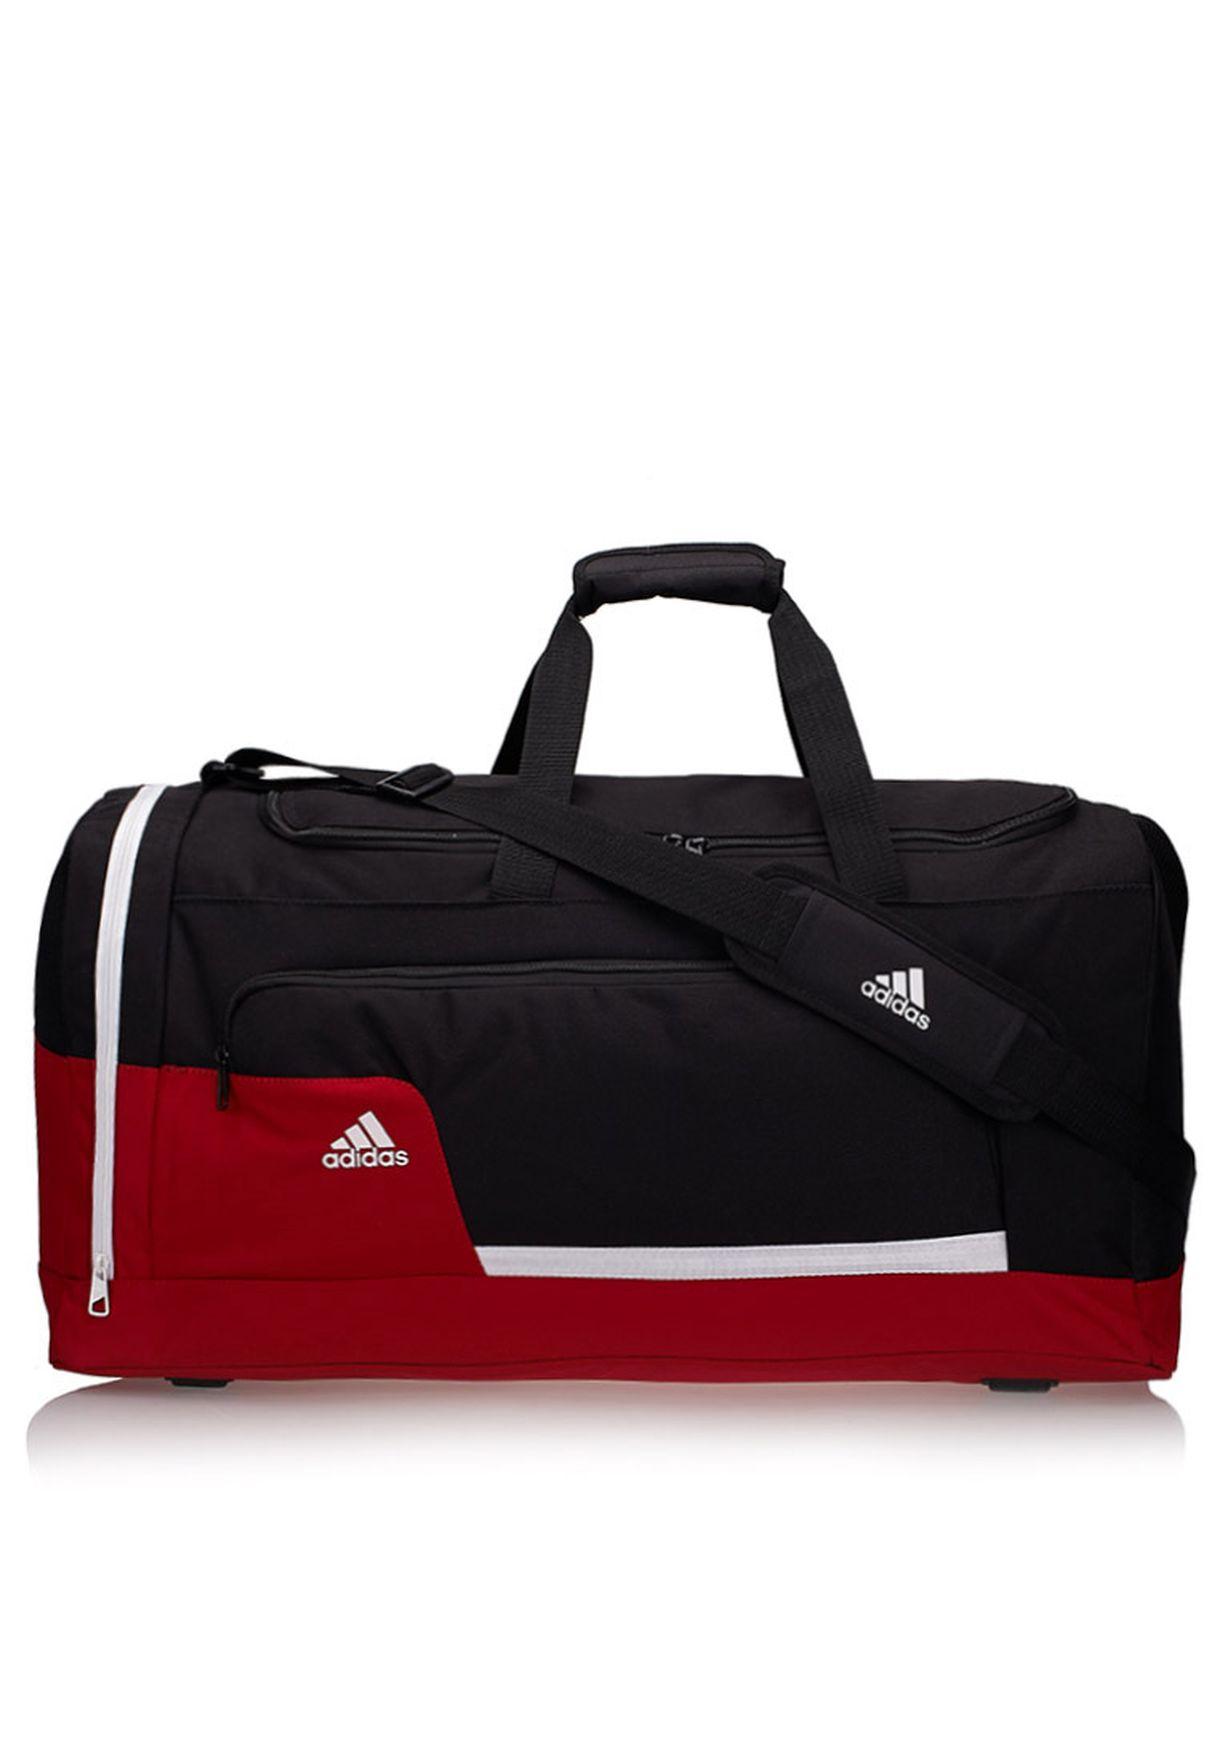 5c039e0d05cb Shop adidas black Large Tiro Duffel Bag Z09818 for Men in Saudi -  AD476AT37OHM